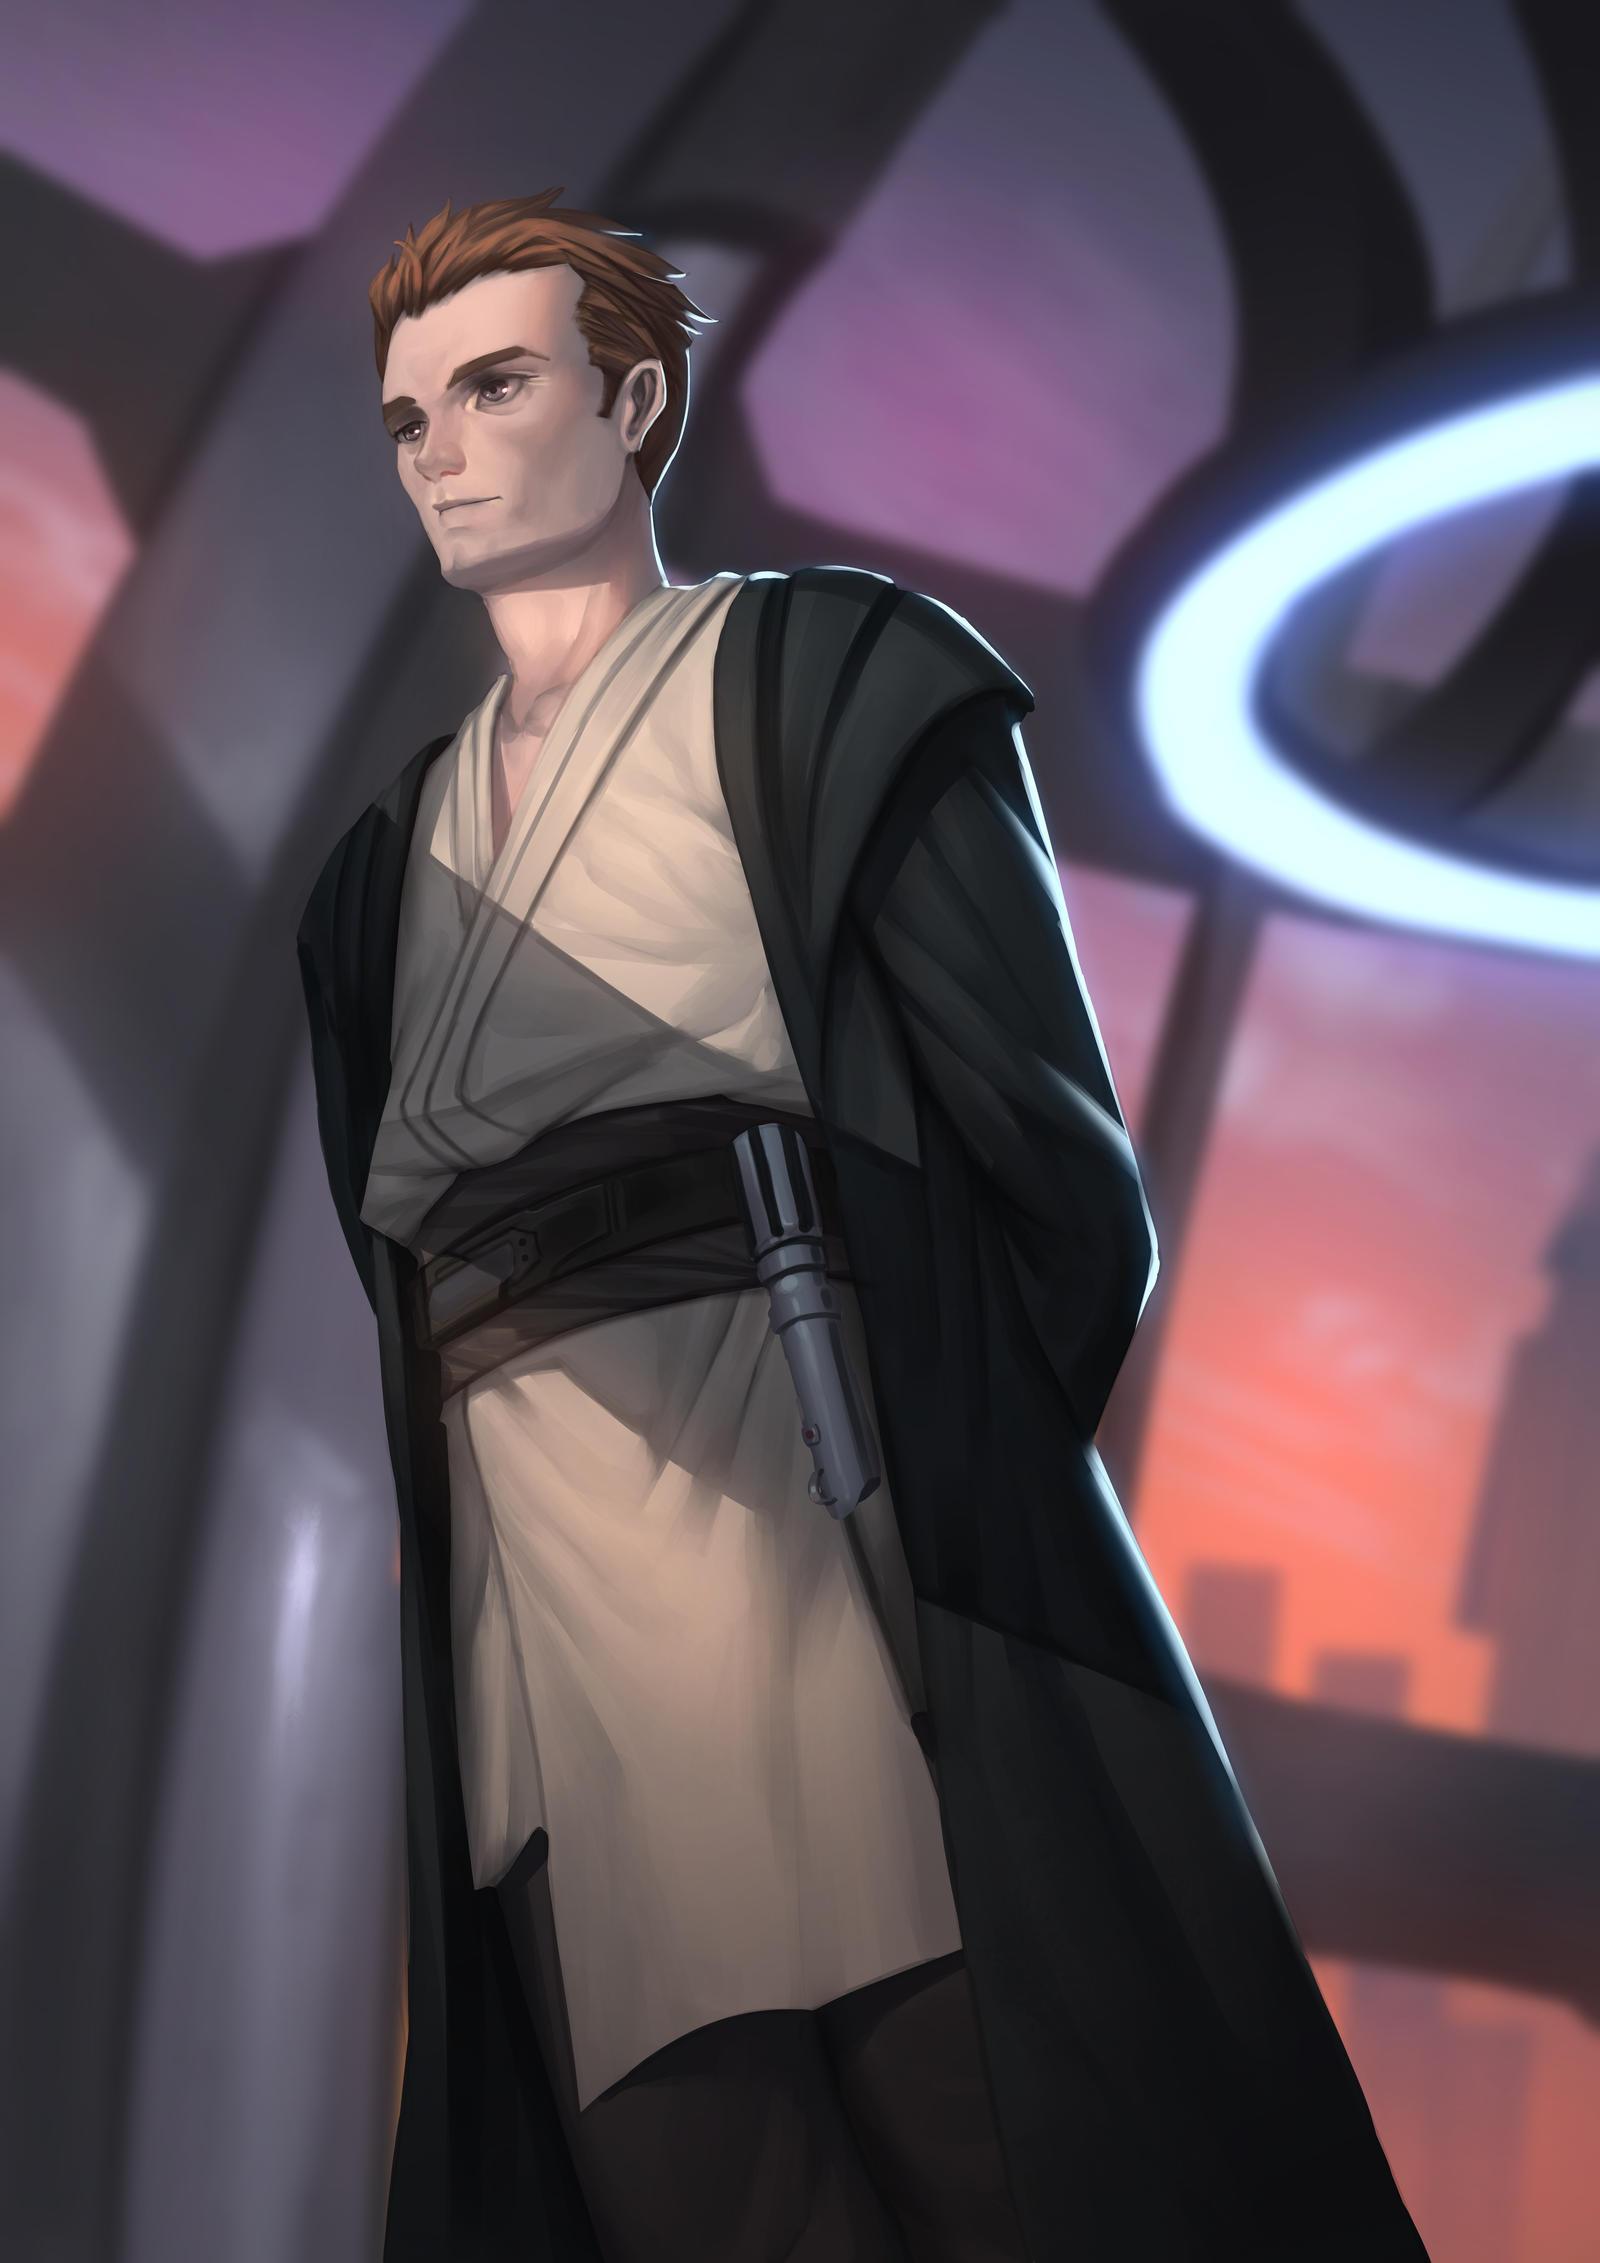 Master Anakin Skywalker by Shoguneagle